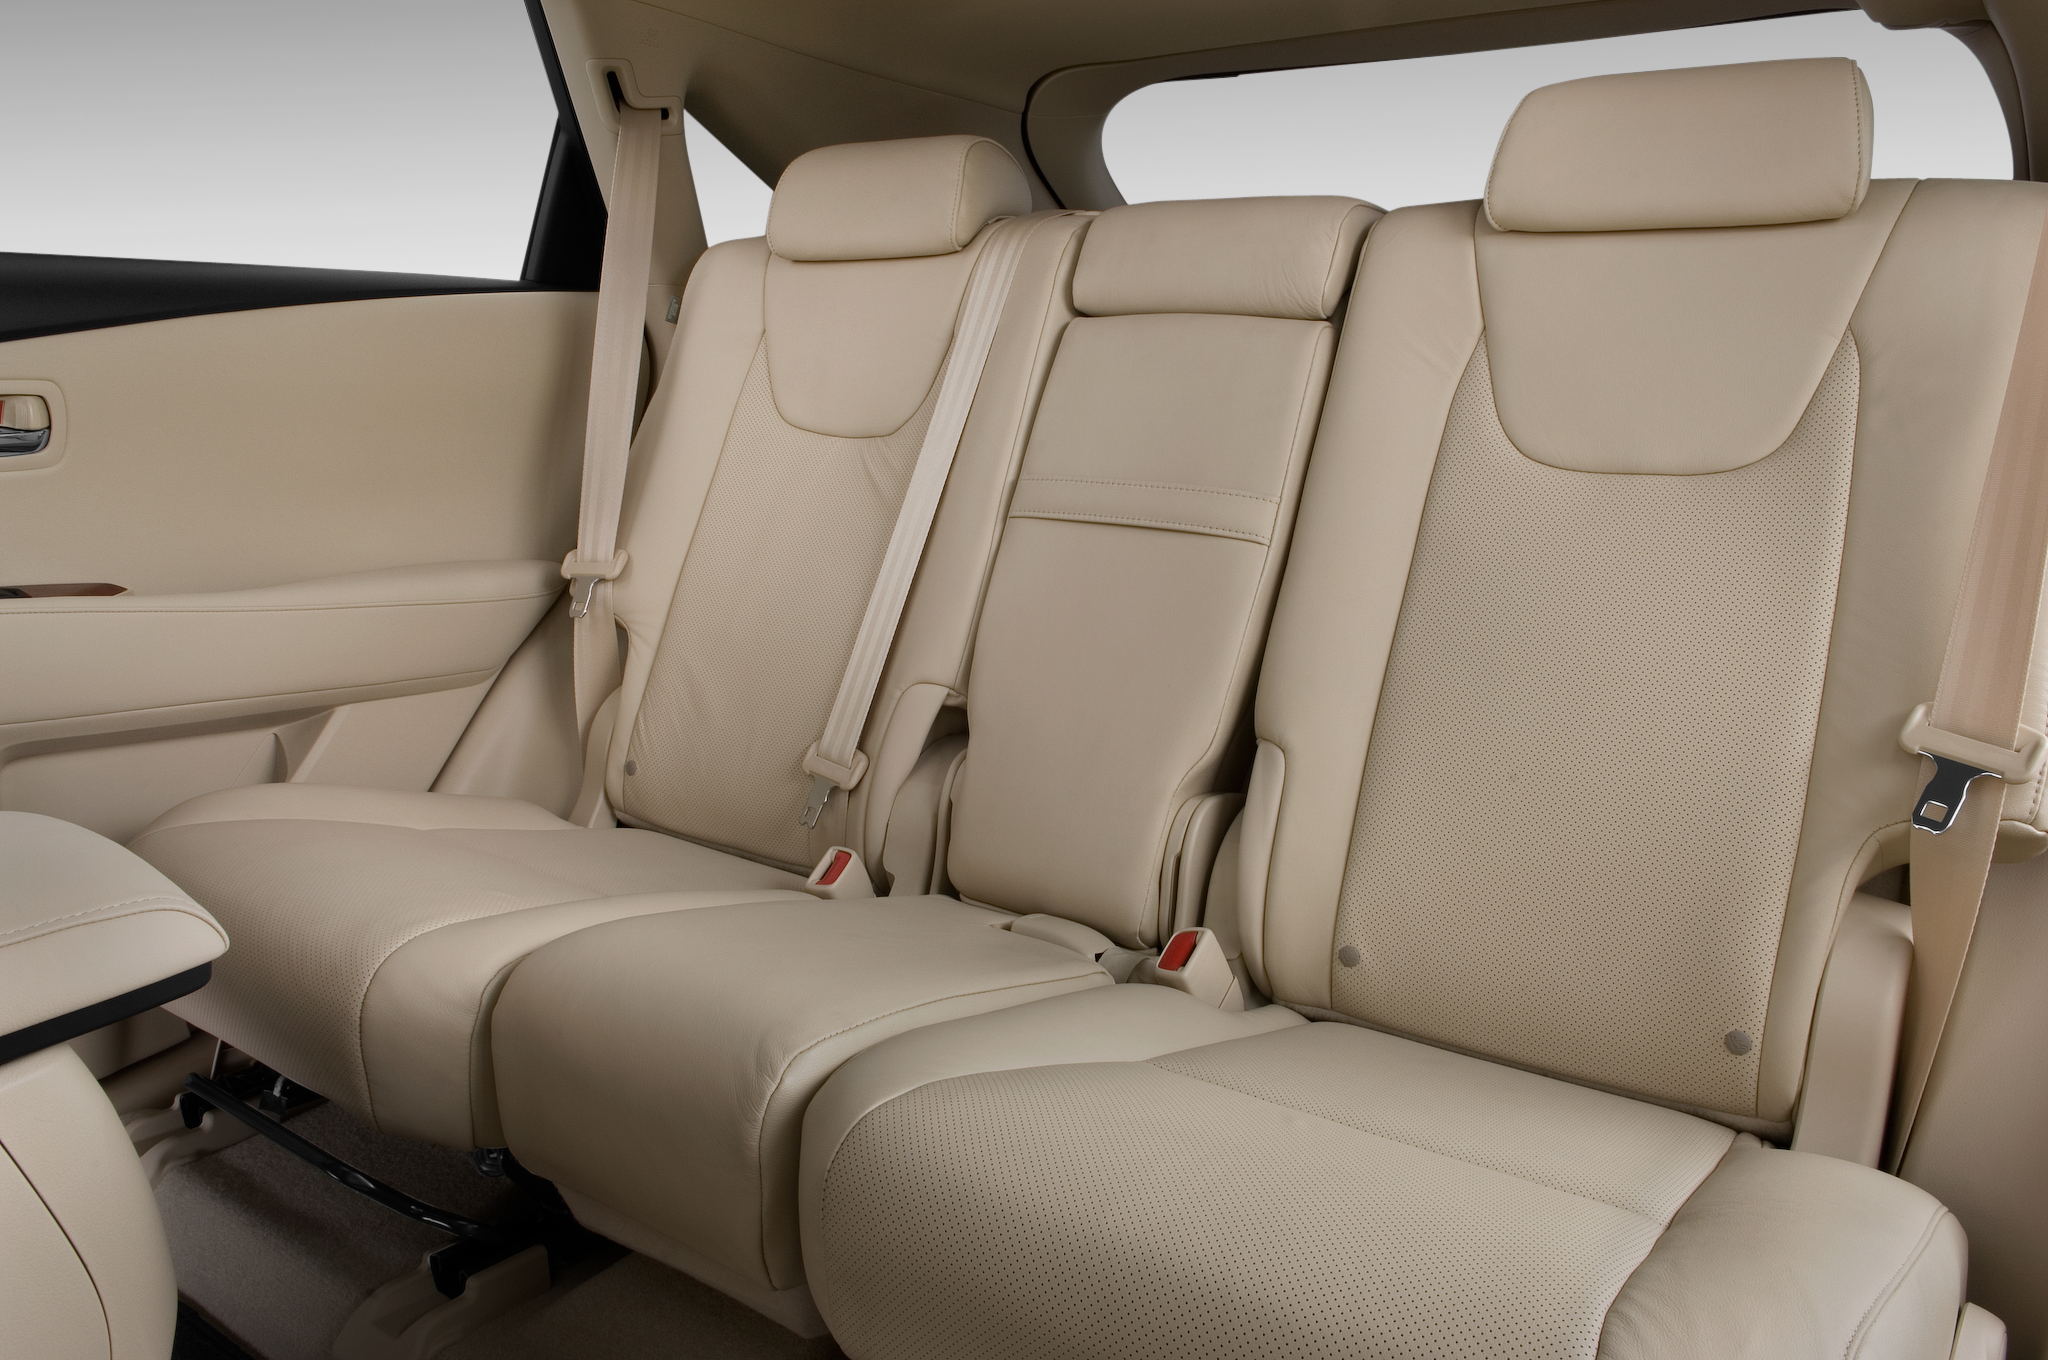 2010 Lexus Rx350 Lexus Luxury Crossover Suv Review